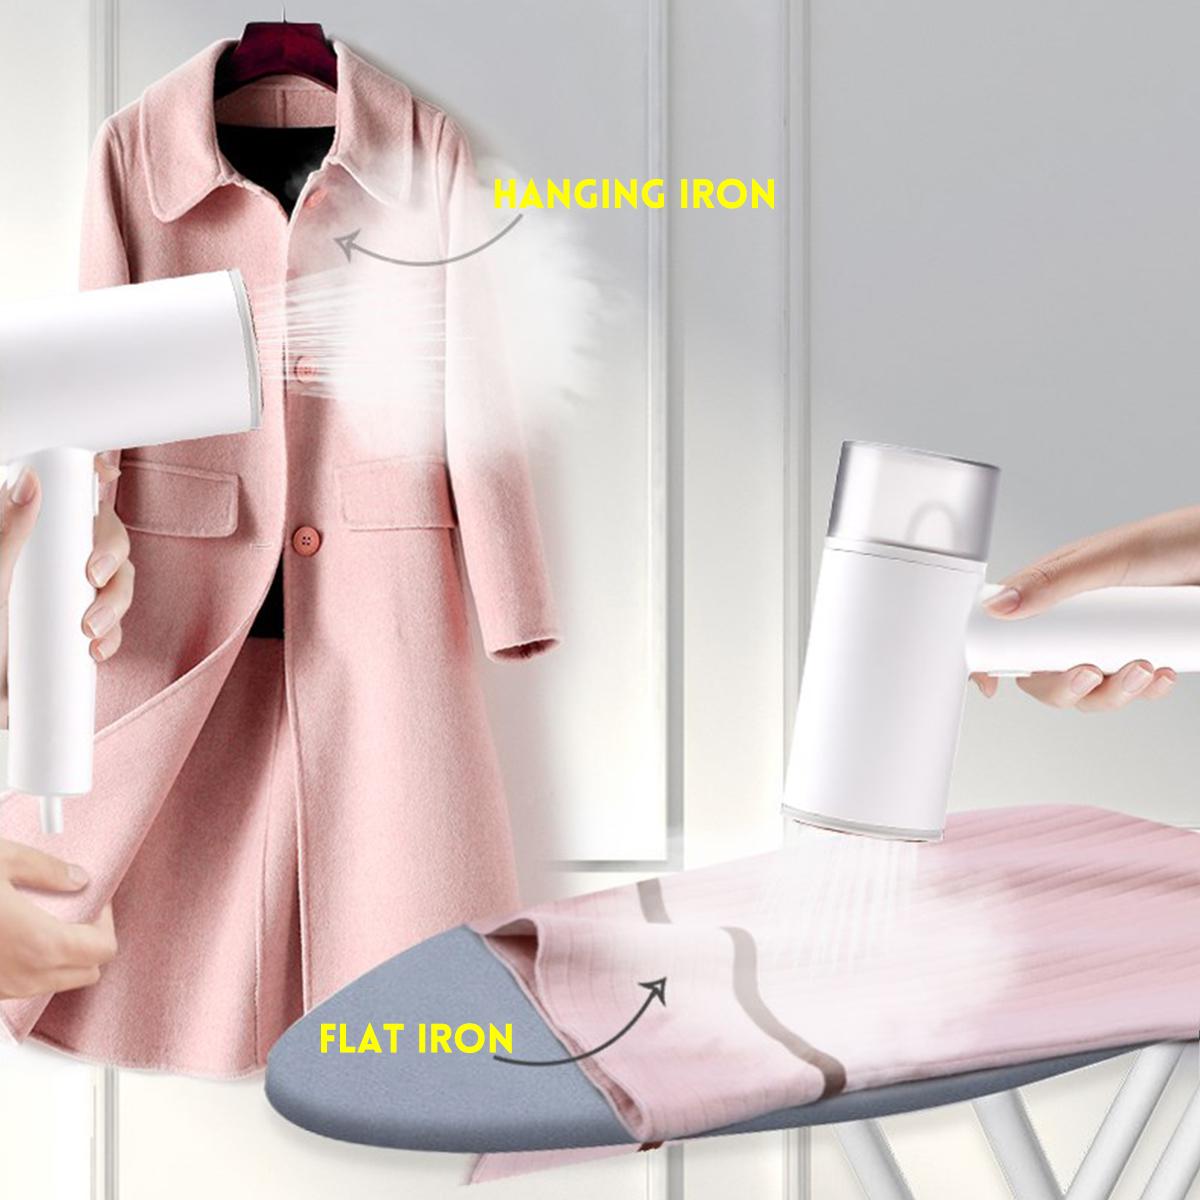 Portable Handheld Household Steam Iron 220V 1200W Garment Ironing Machine for Home Travel